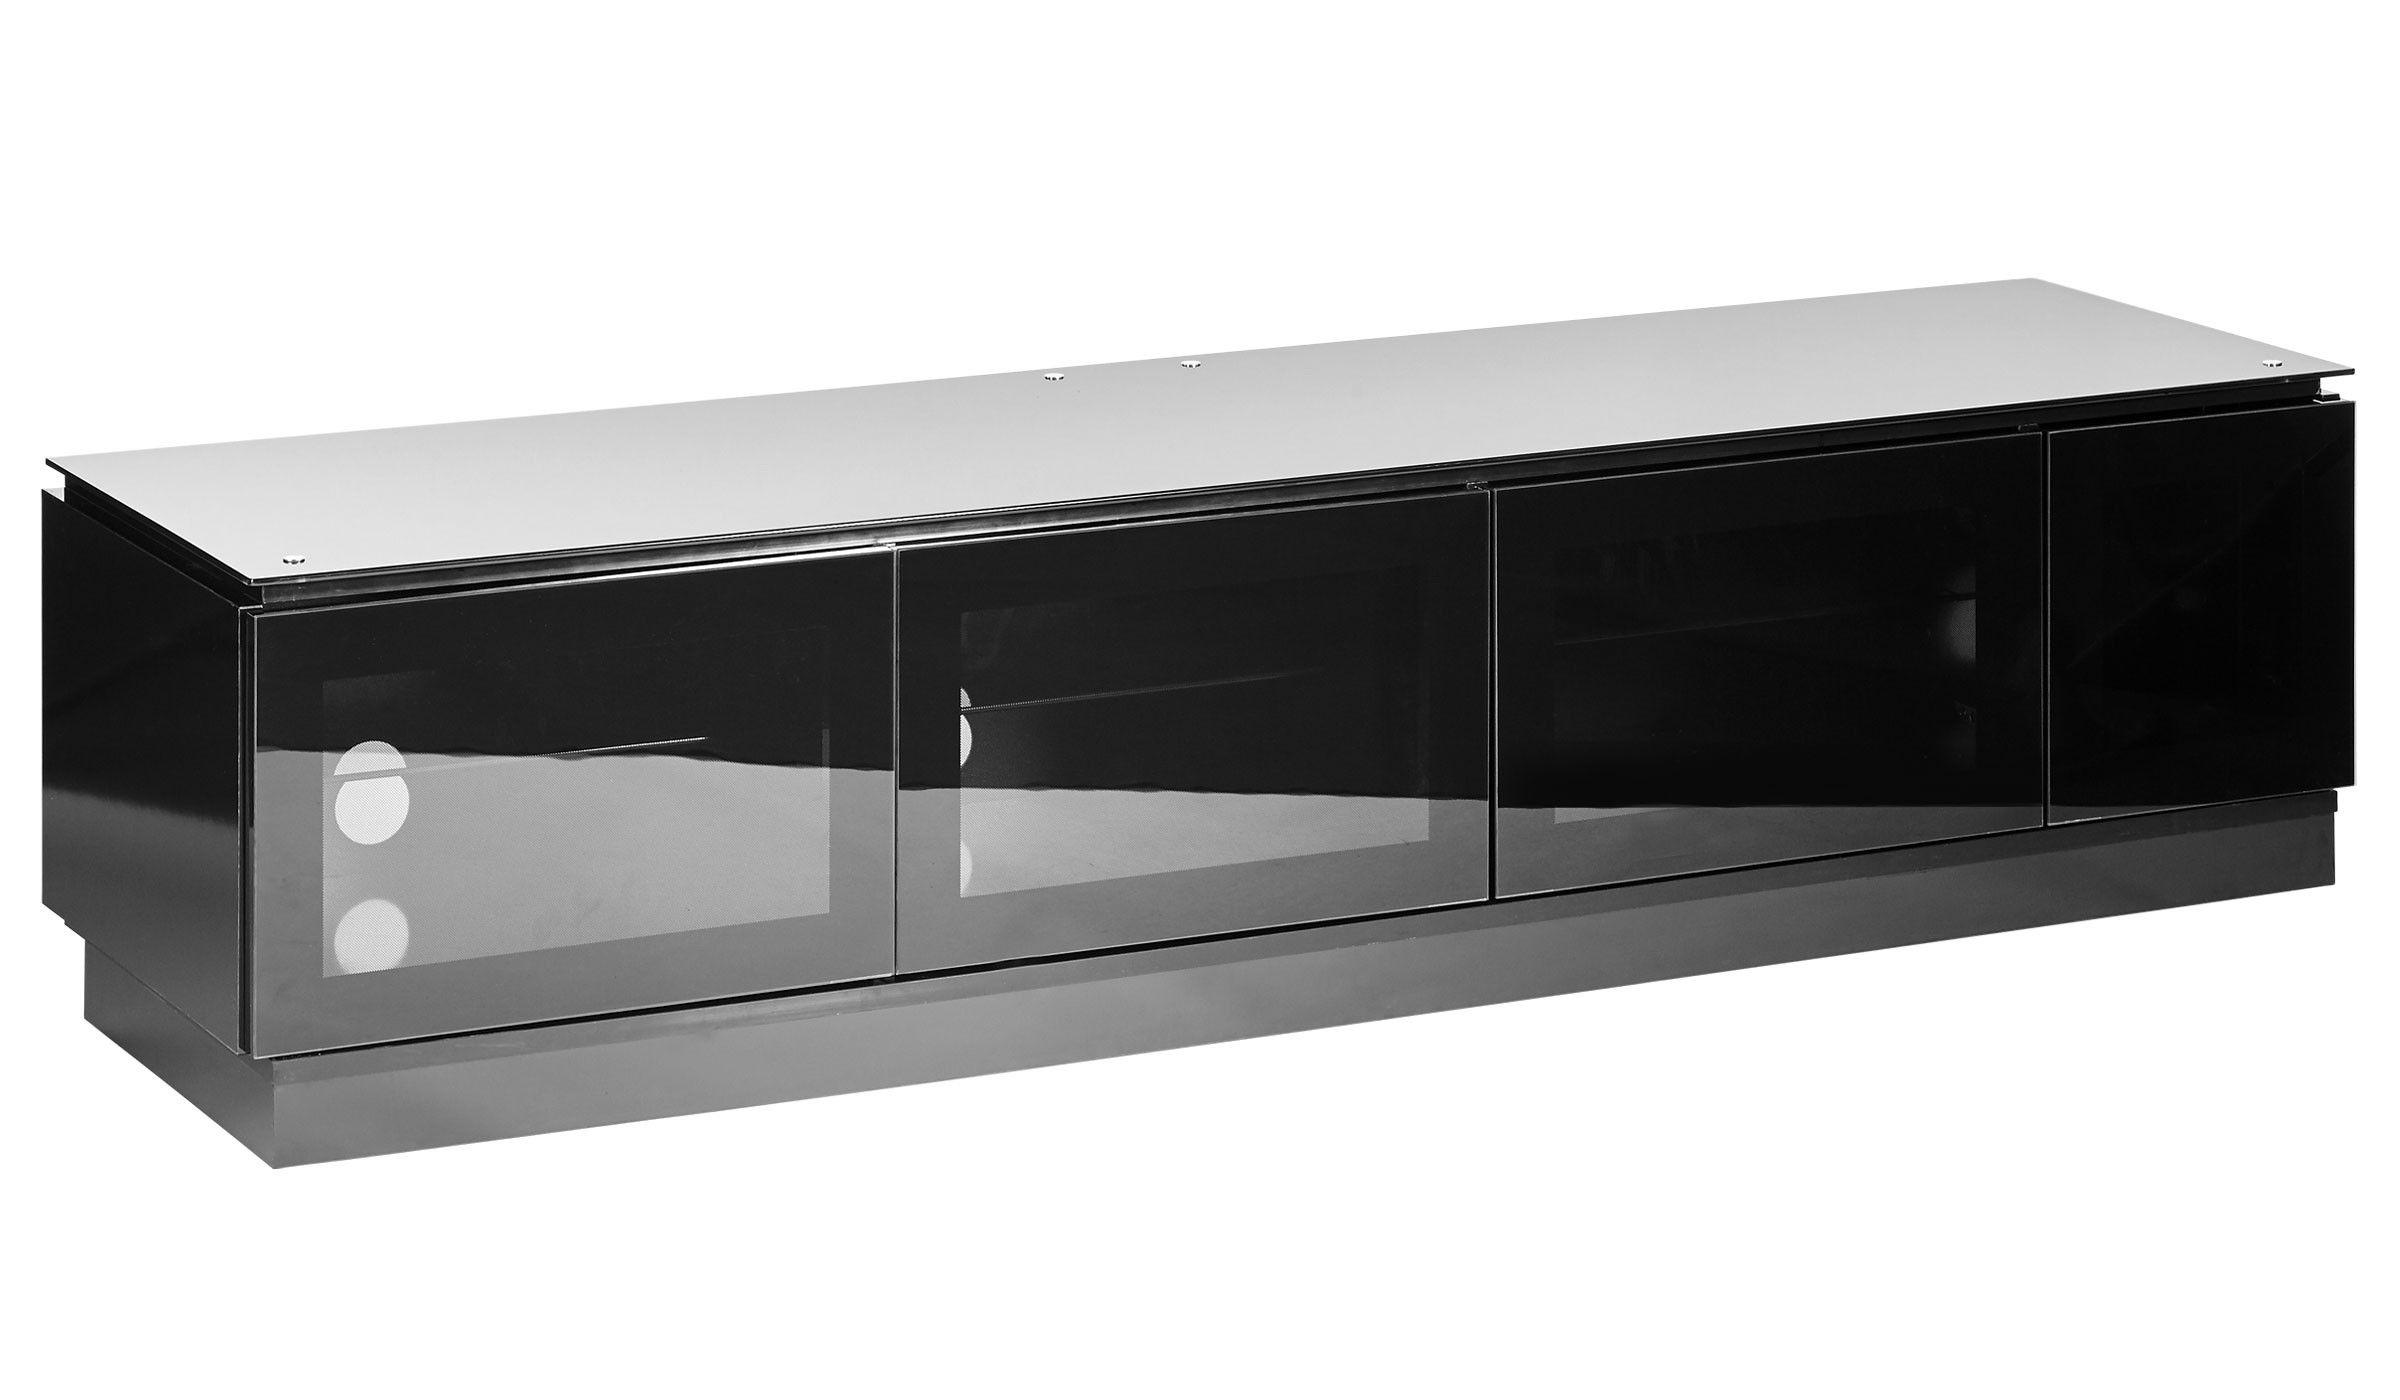 Black Gloss Tv Unit Up To 80 Inch Flat Screen Tv Mmt D1800 Black Gloss Tv Unit Tv Cabinets Black Gloss